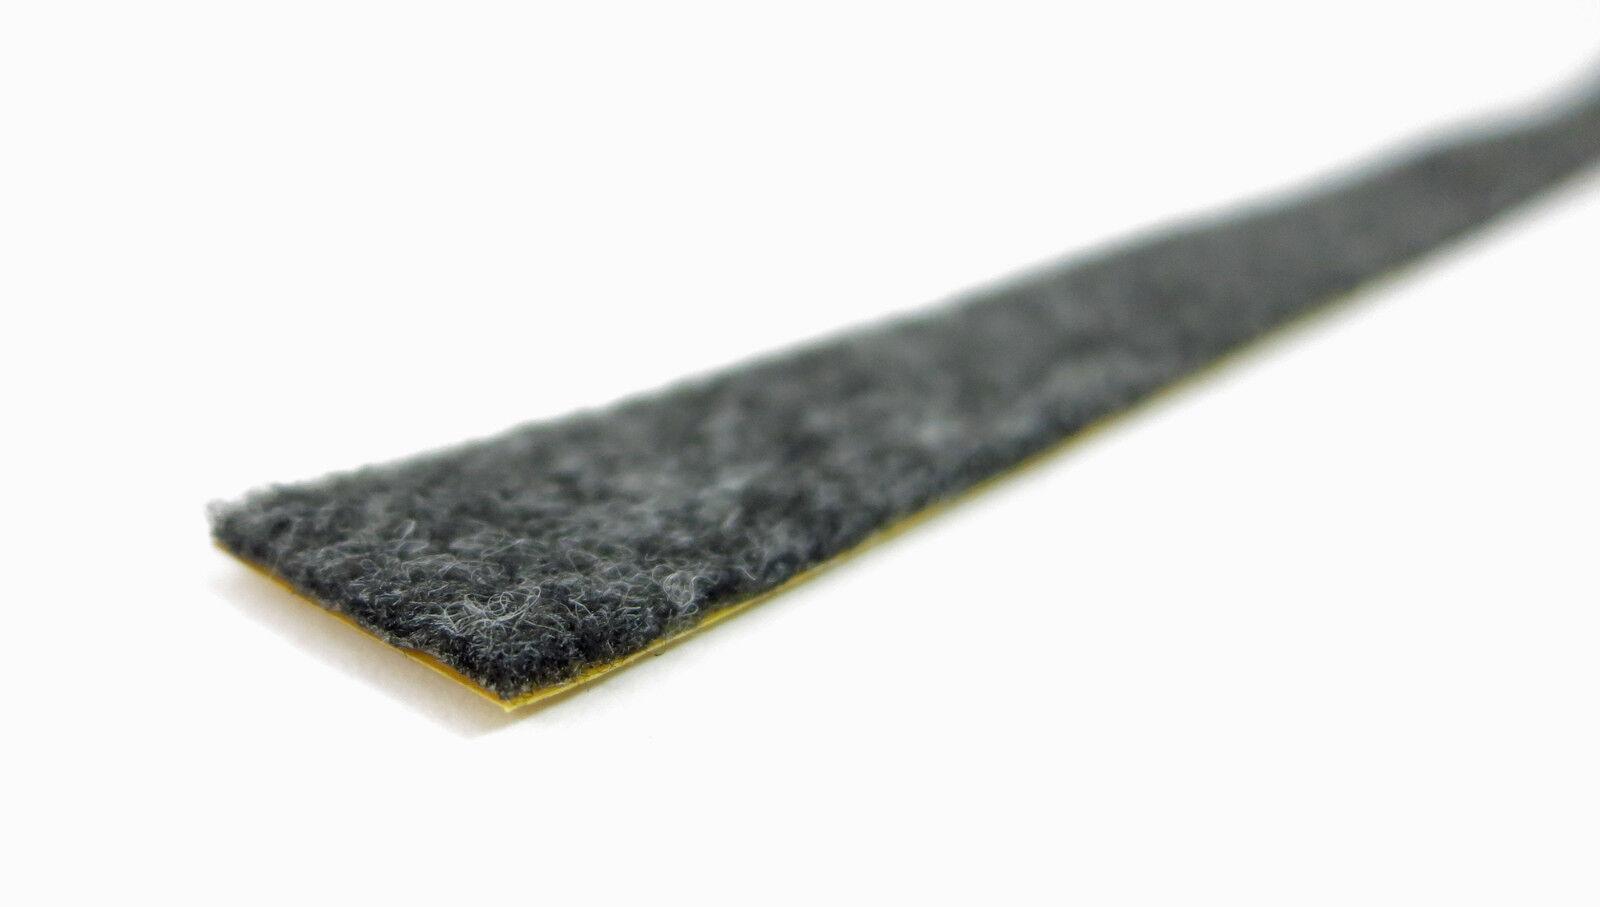 Filz selbstklebend Filzgleiter Filz Meterware grau 10mm dick ab 0,1m